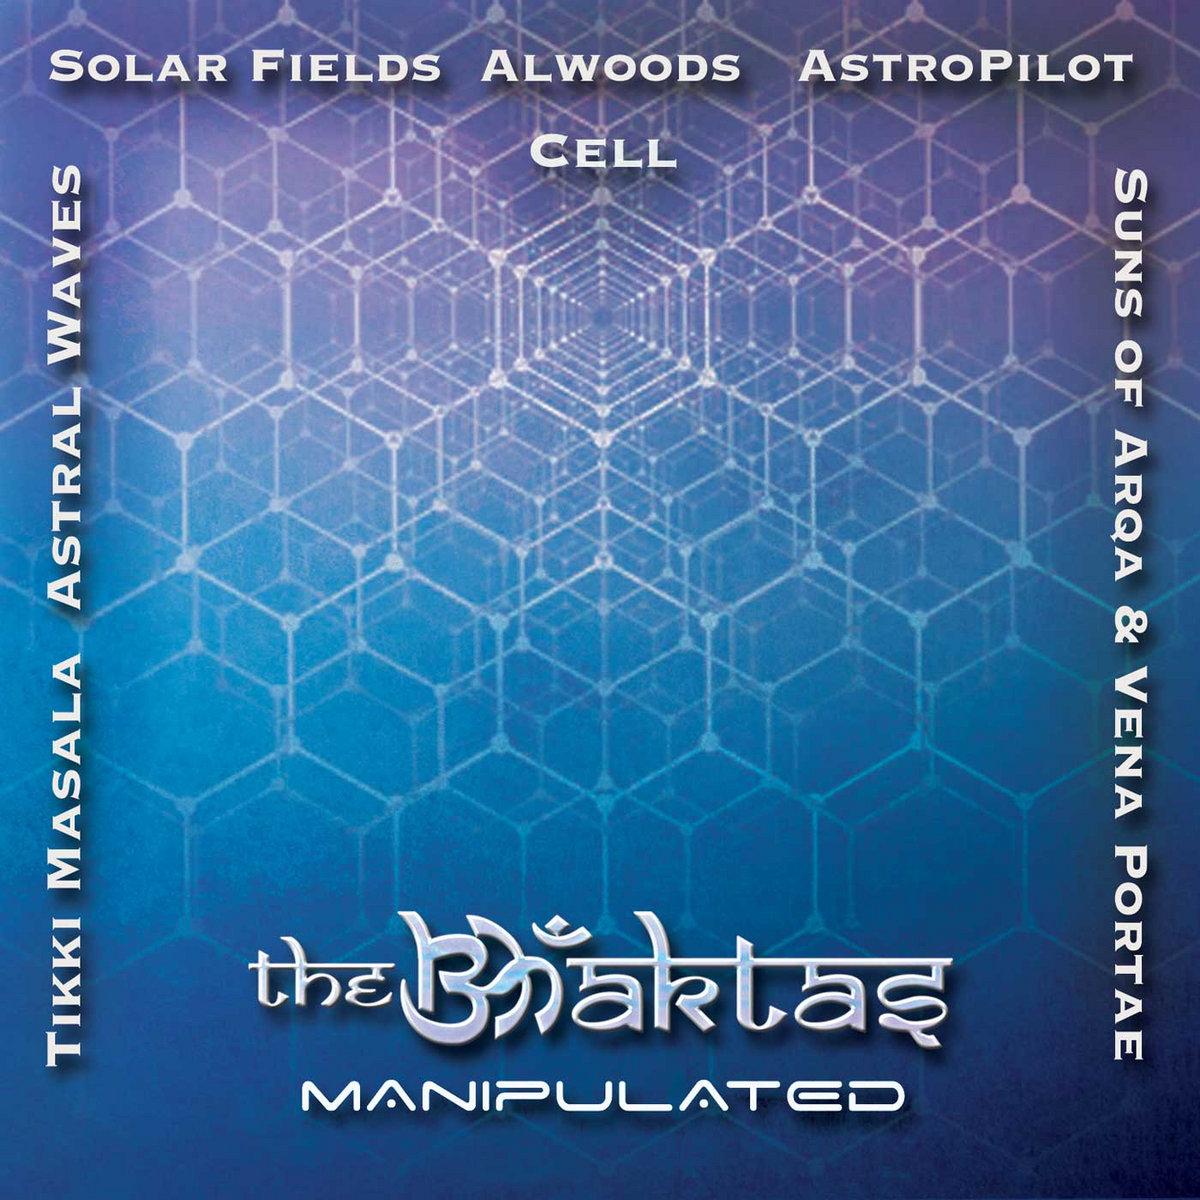 Mantra remix song download anup jalota djbaap. Com.